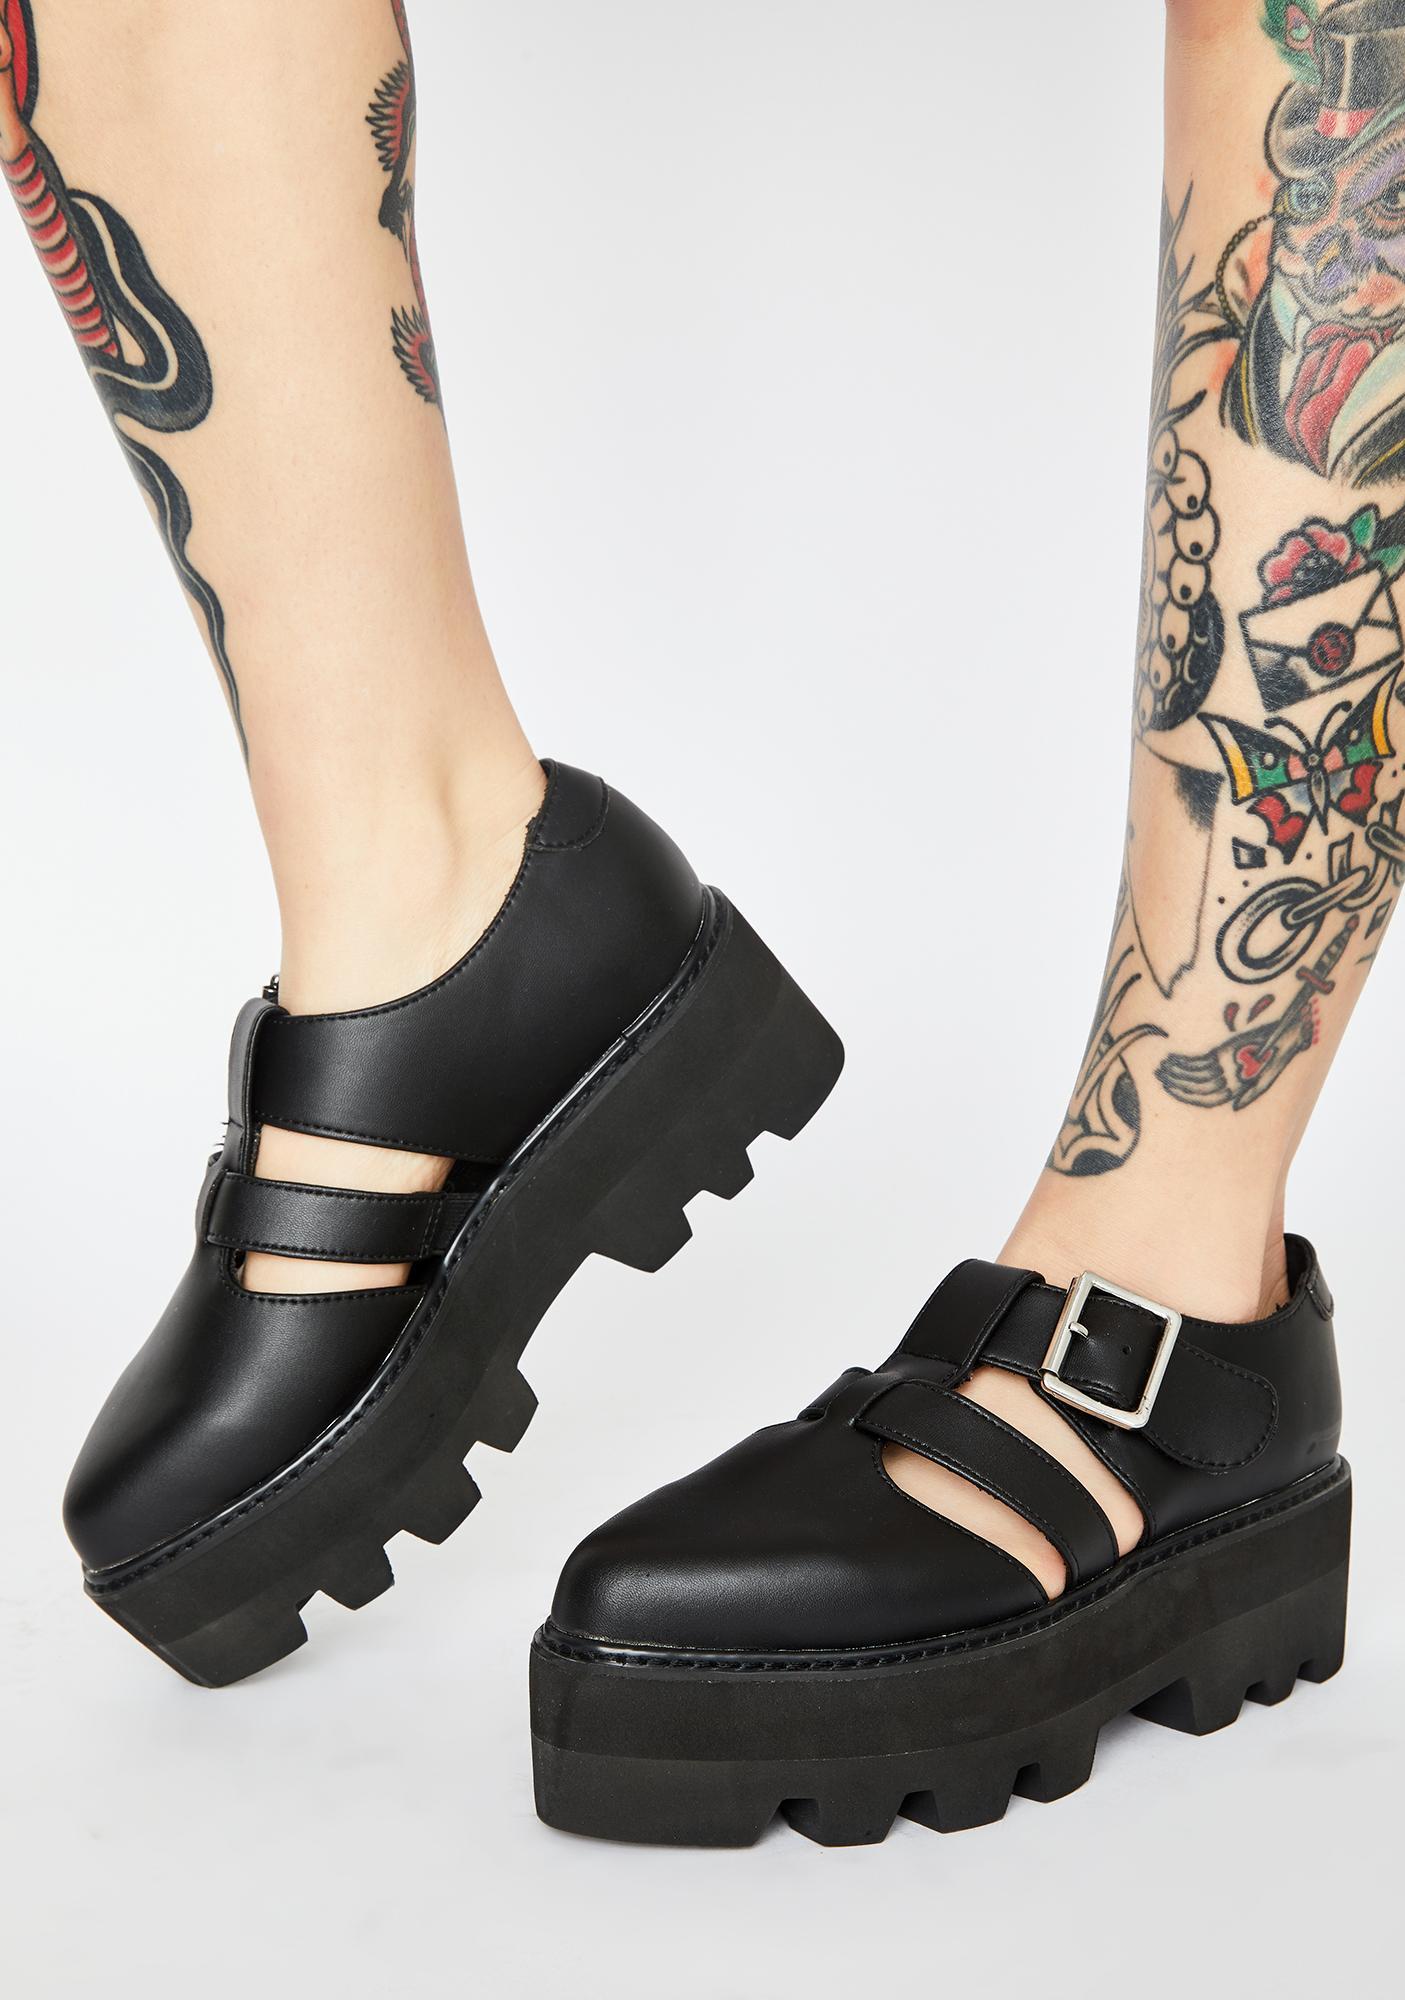 T.U.K. Big Buckle Dino Lug Sandals